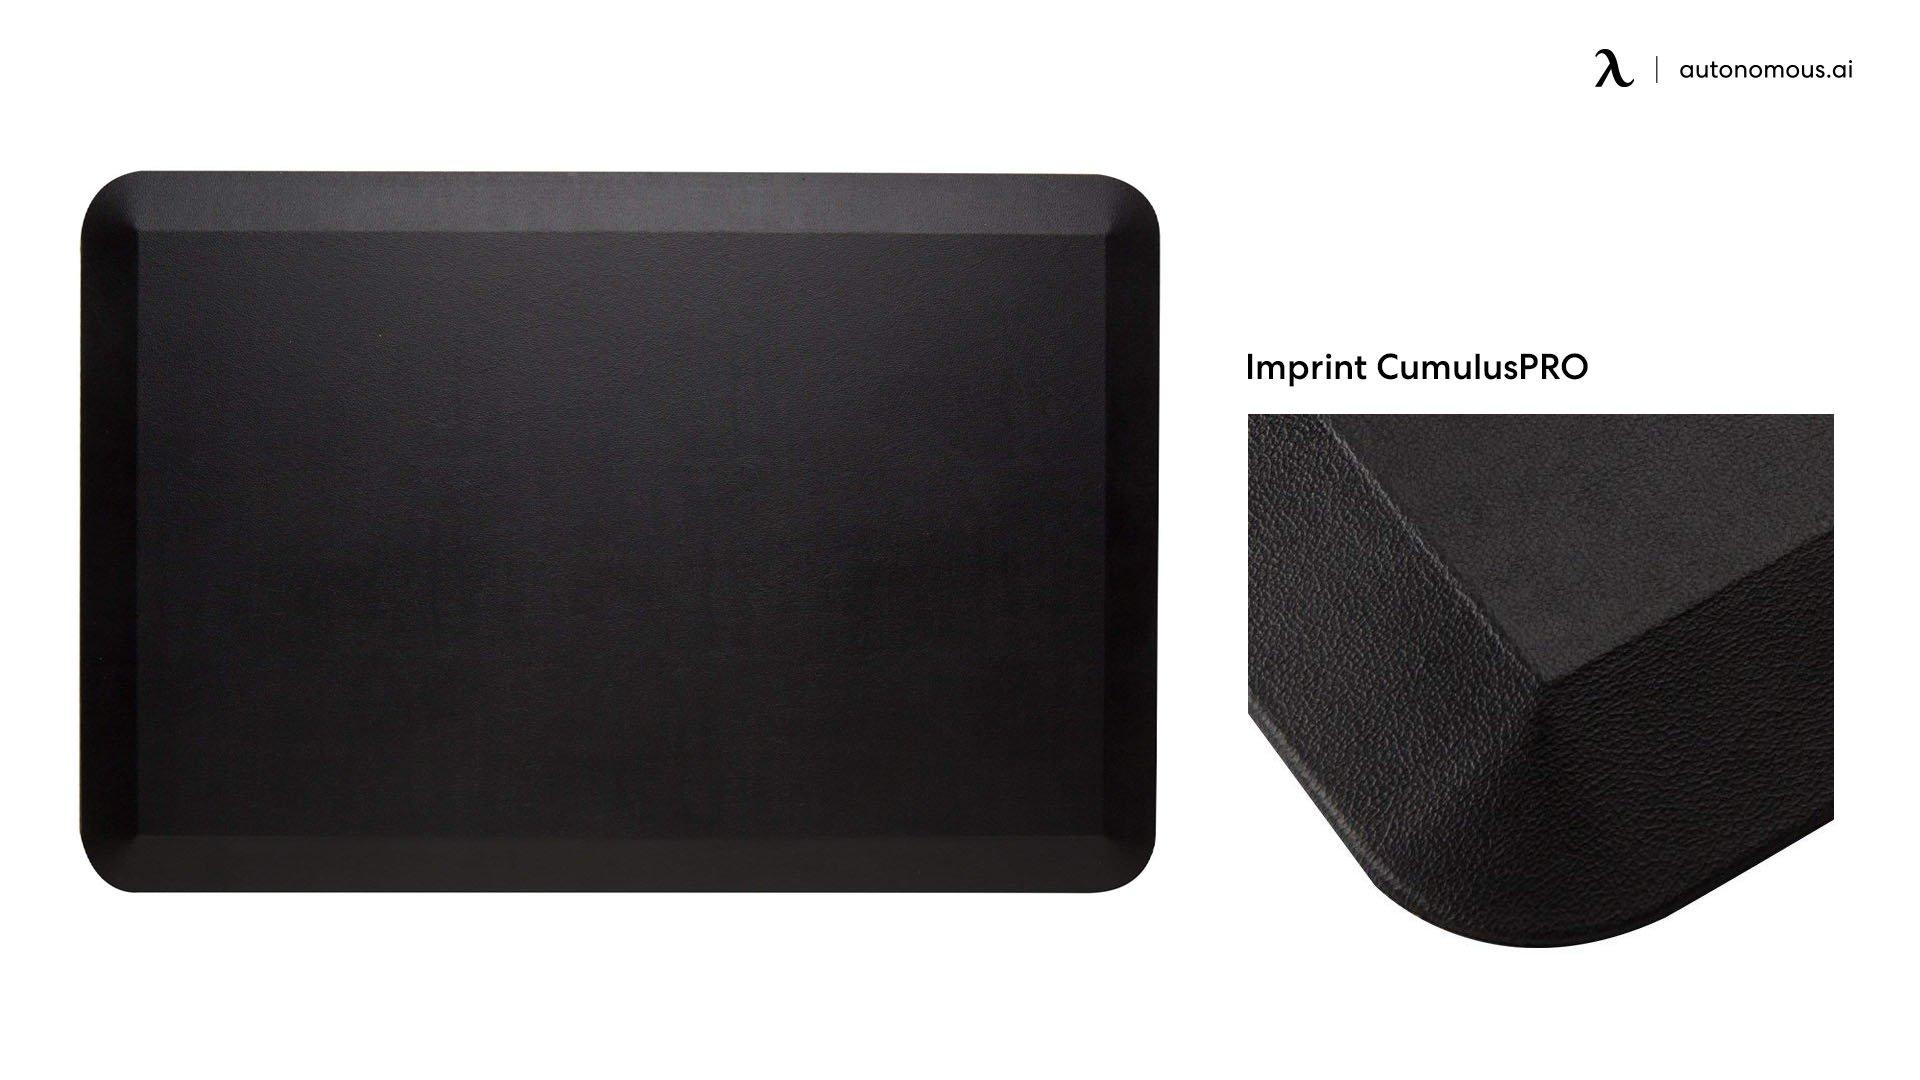 Imprint CumulusPRO